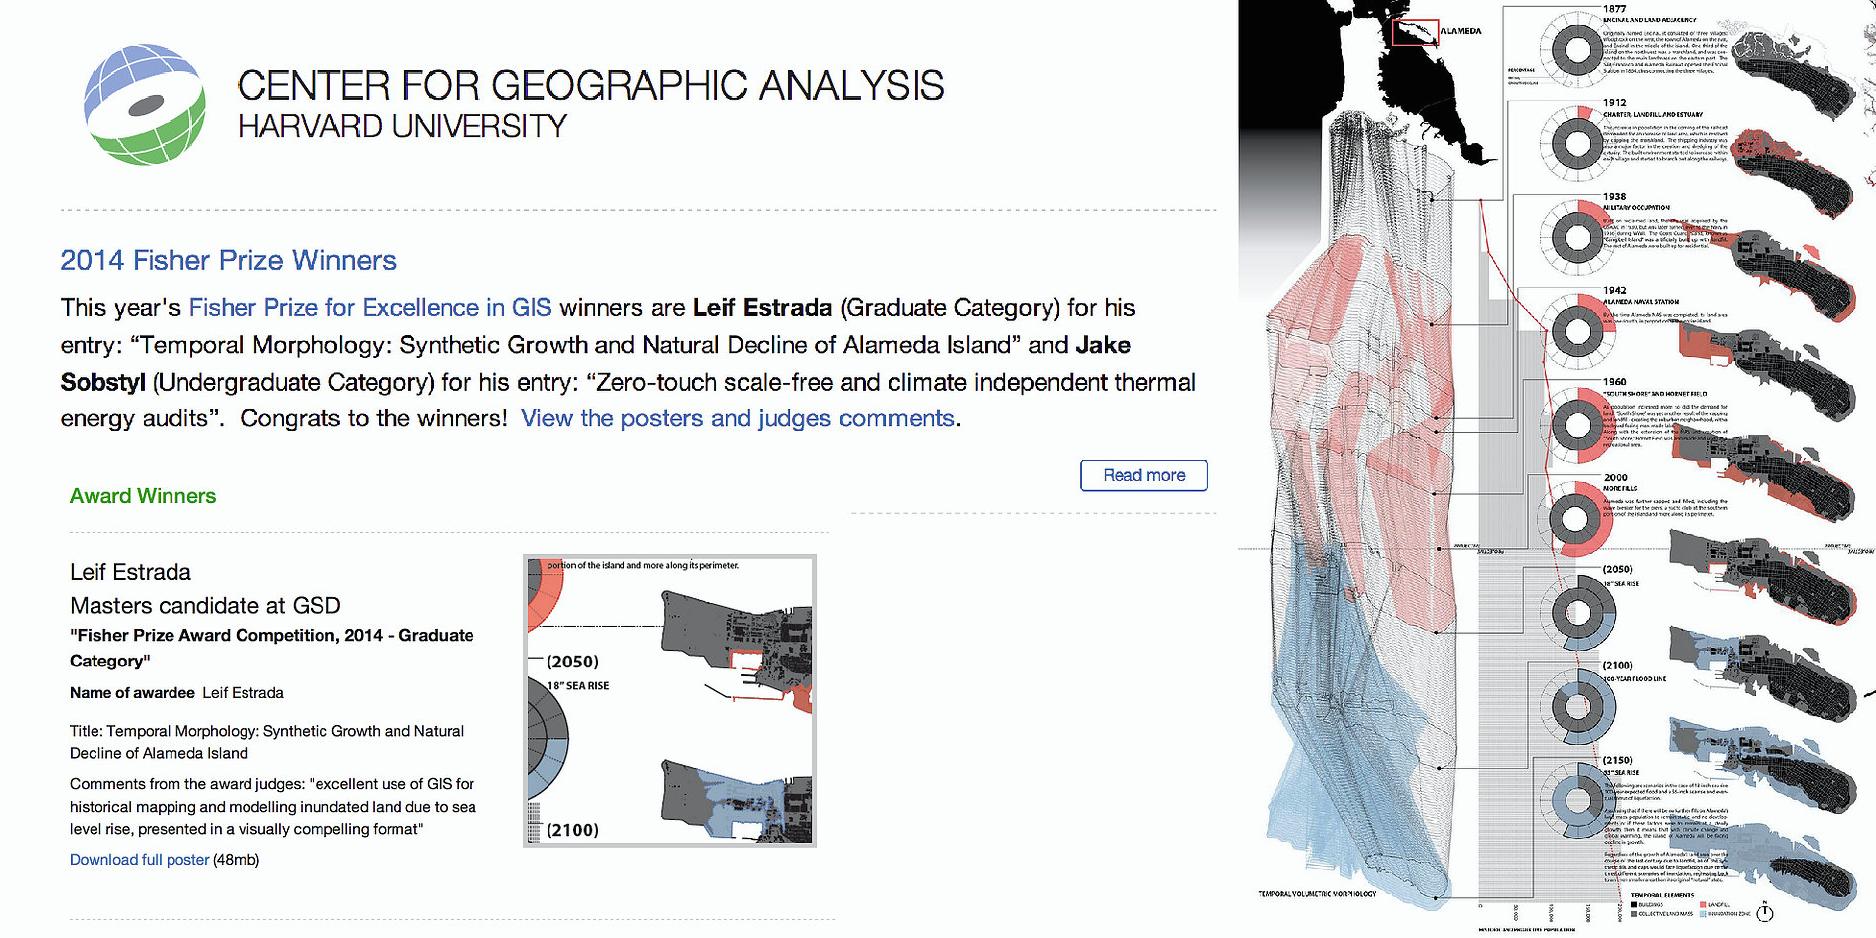 Howard T Fisher Prize Award for Geographic Information Science at Harvard University (Harvard CGA)